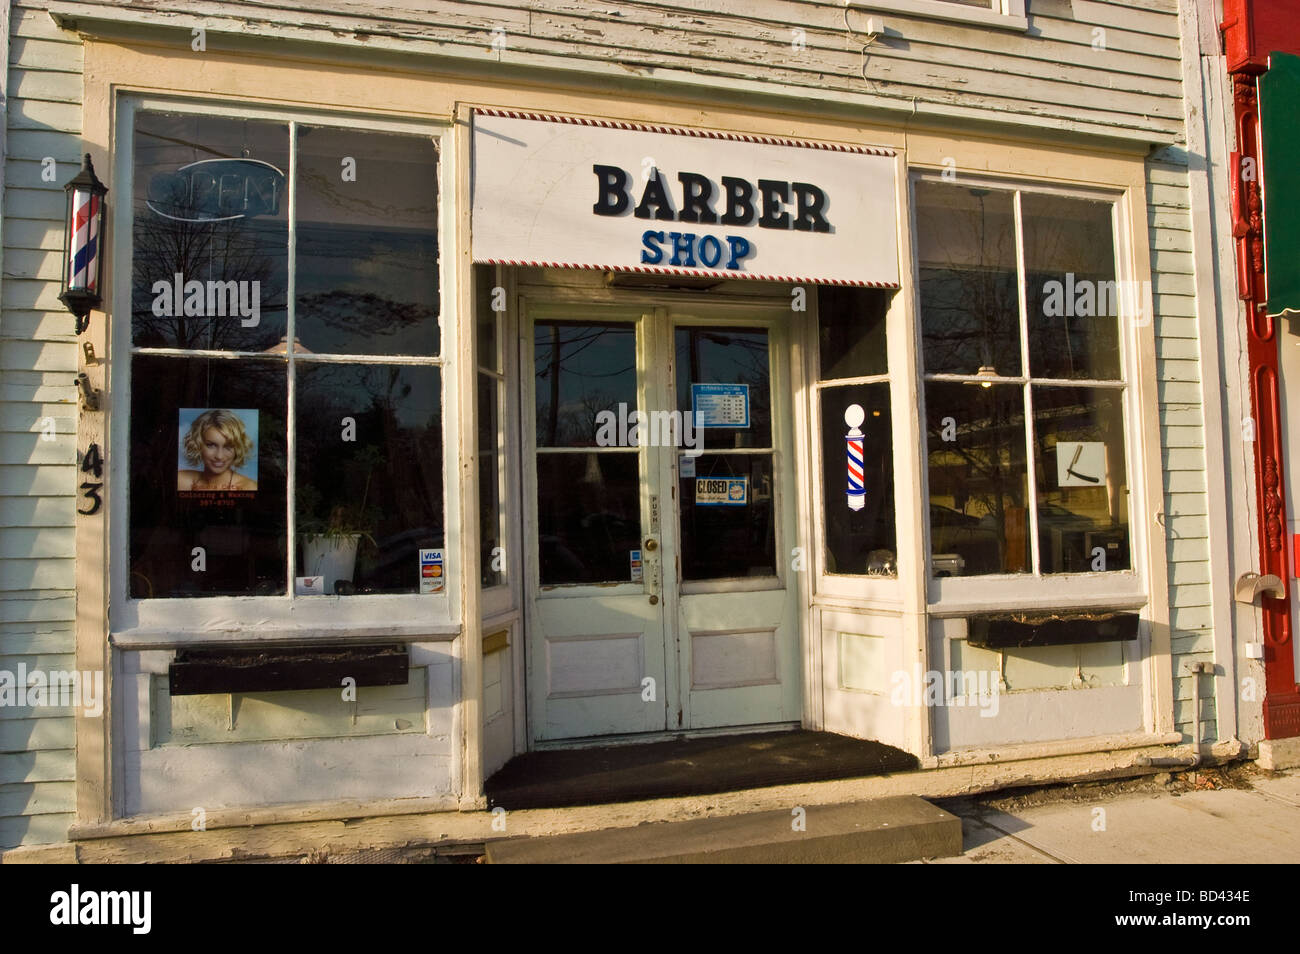 Barber Shop, Trumansburg, , Finger Lakes region, New York, NY, USA, US, United States Stock Photo